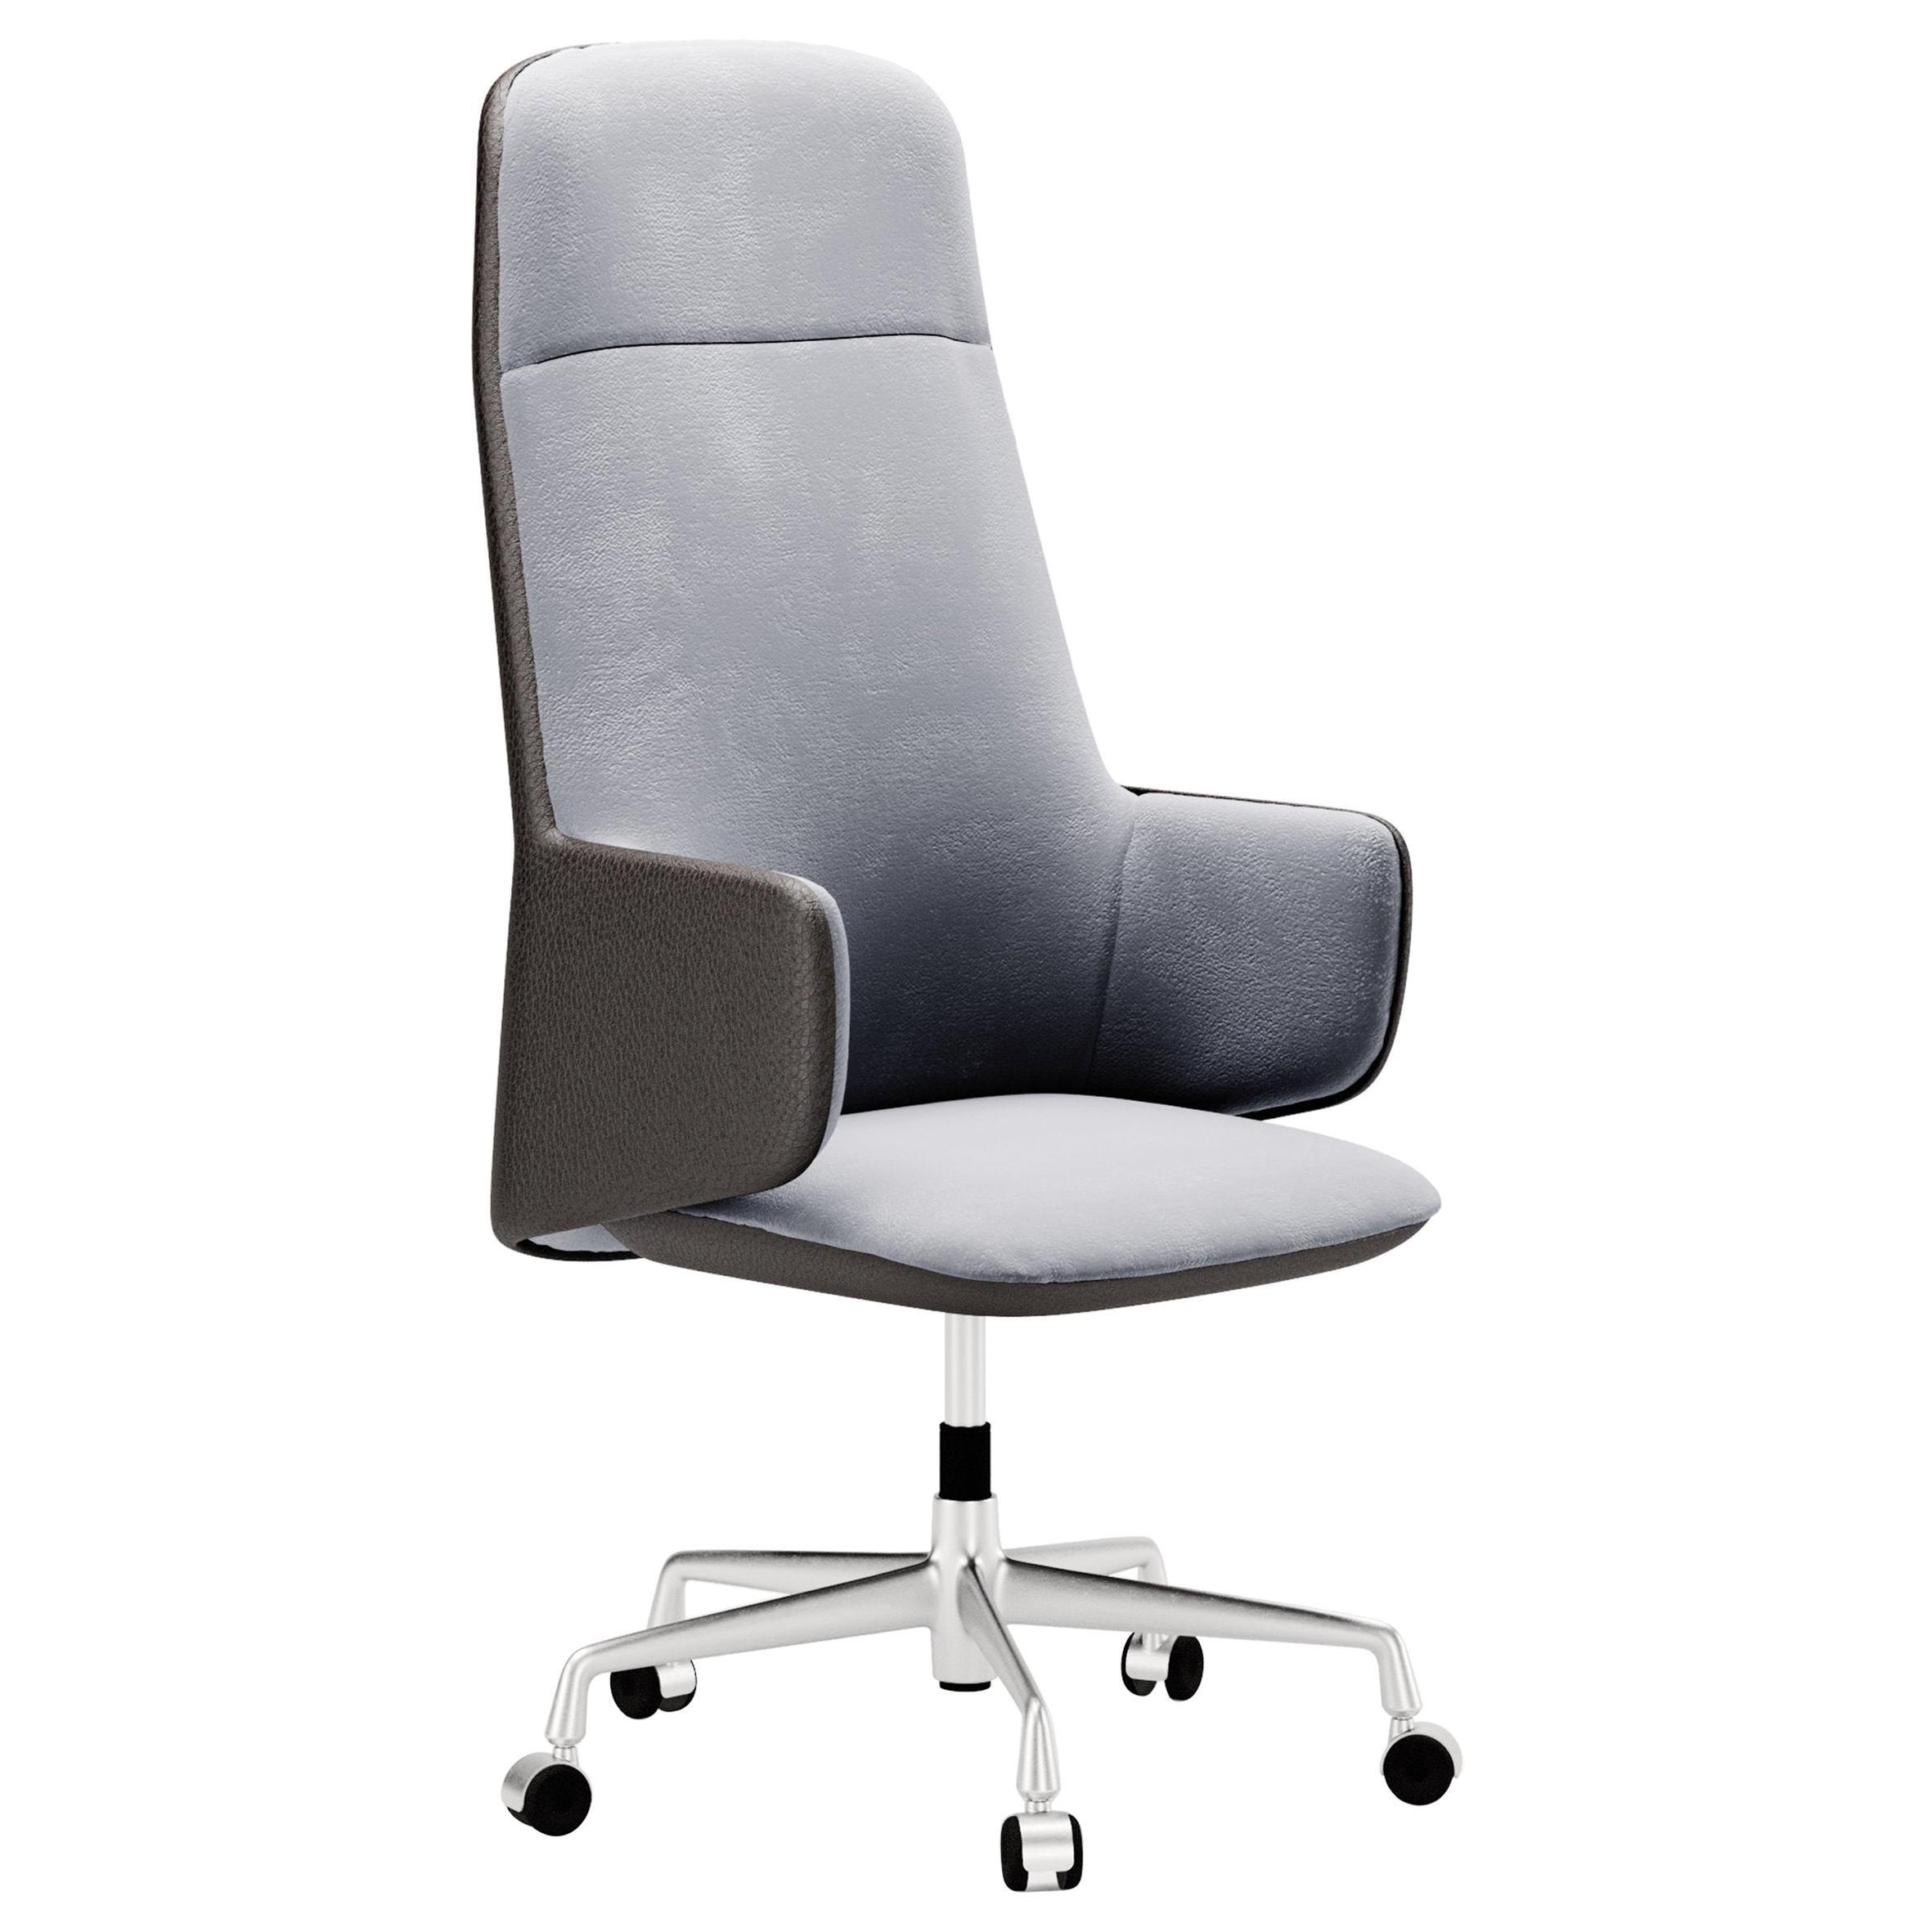 Contemporary Office Chair by Fabio Arcaini Velvet Leather Nabuk